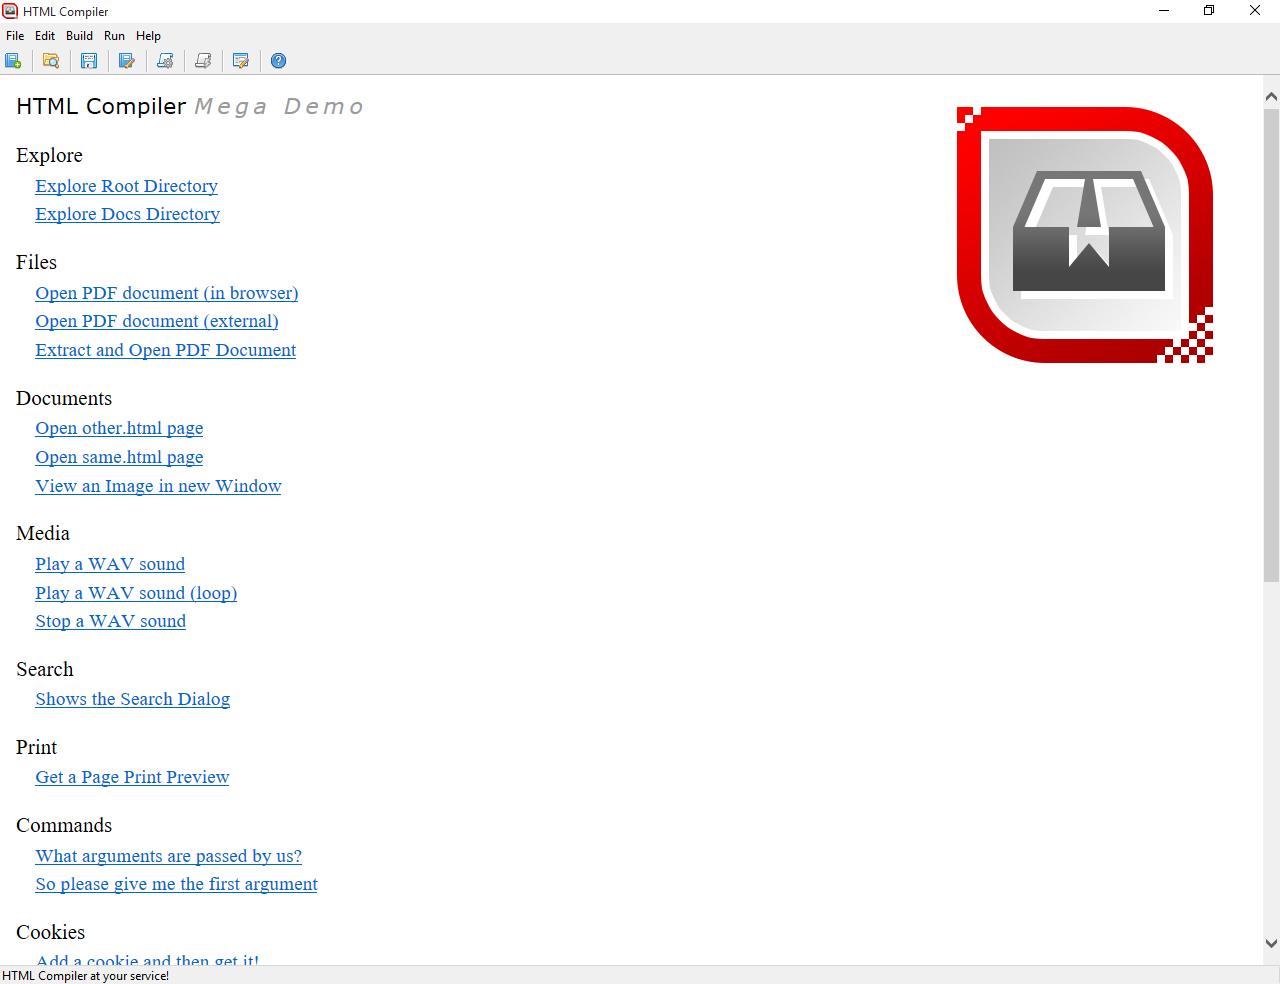 HTML Compiler Screenshot